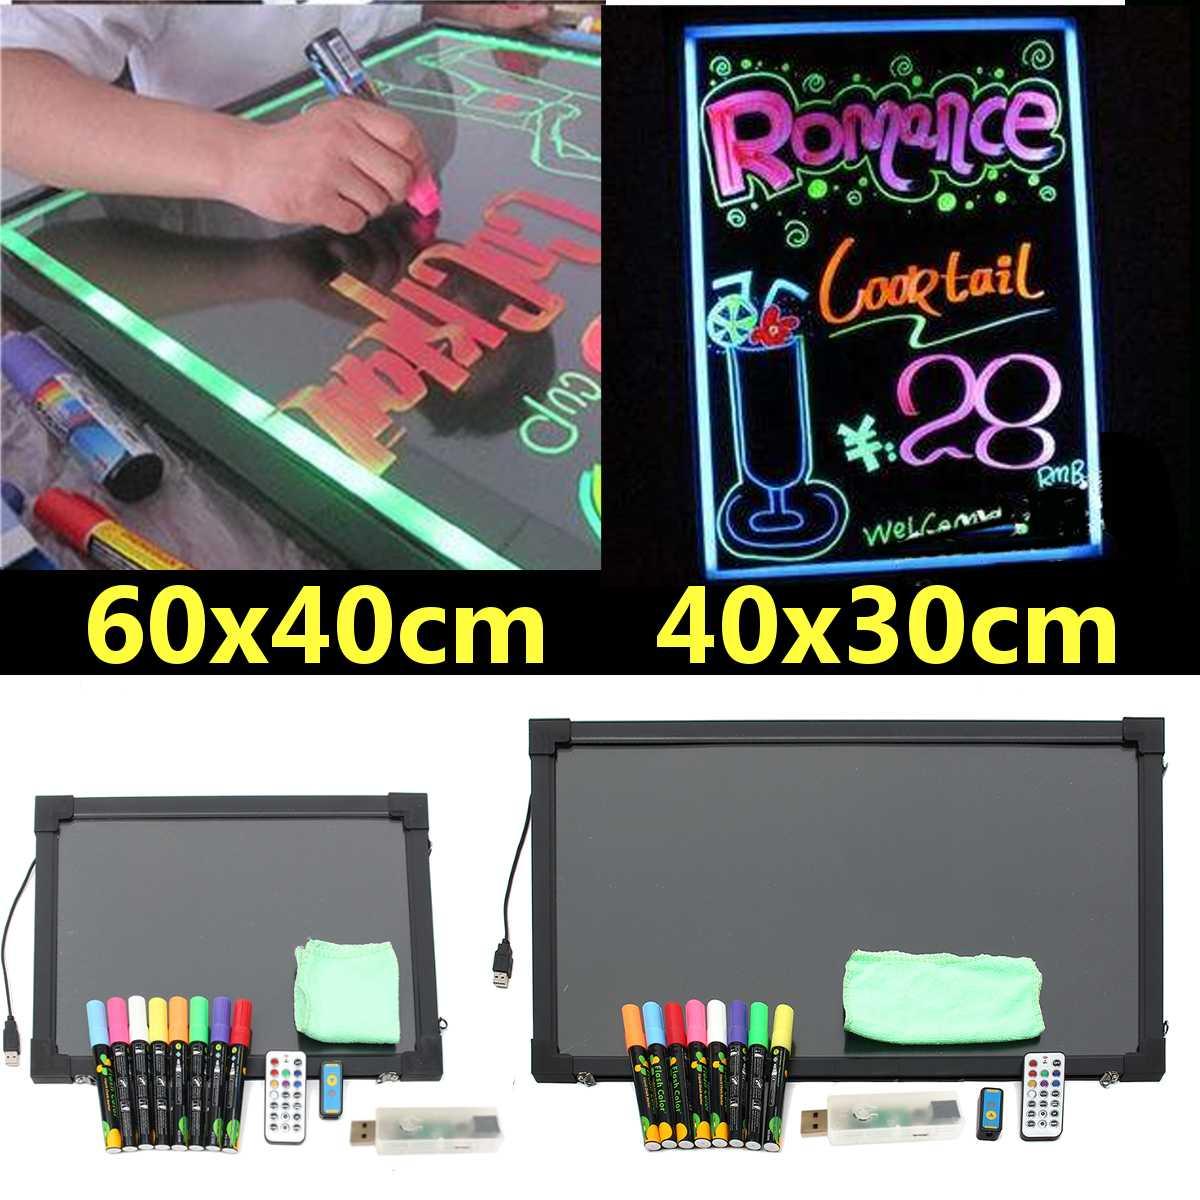 Erasable LED Writing Board + 8 Fluorescent pen Flashing luminated Neon LED advertising panel LED Message Menu Writing Sign Board